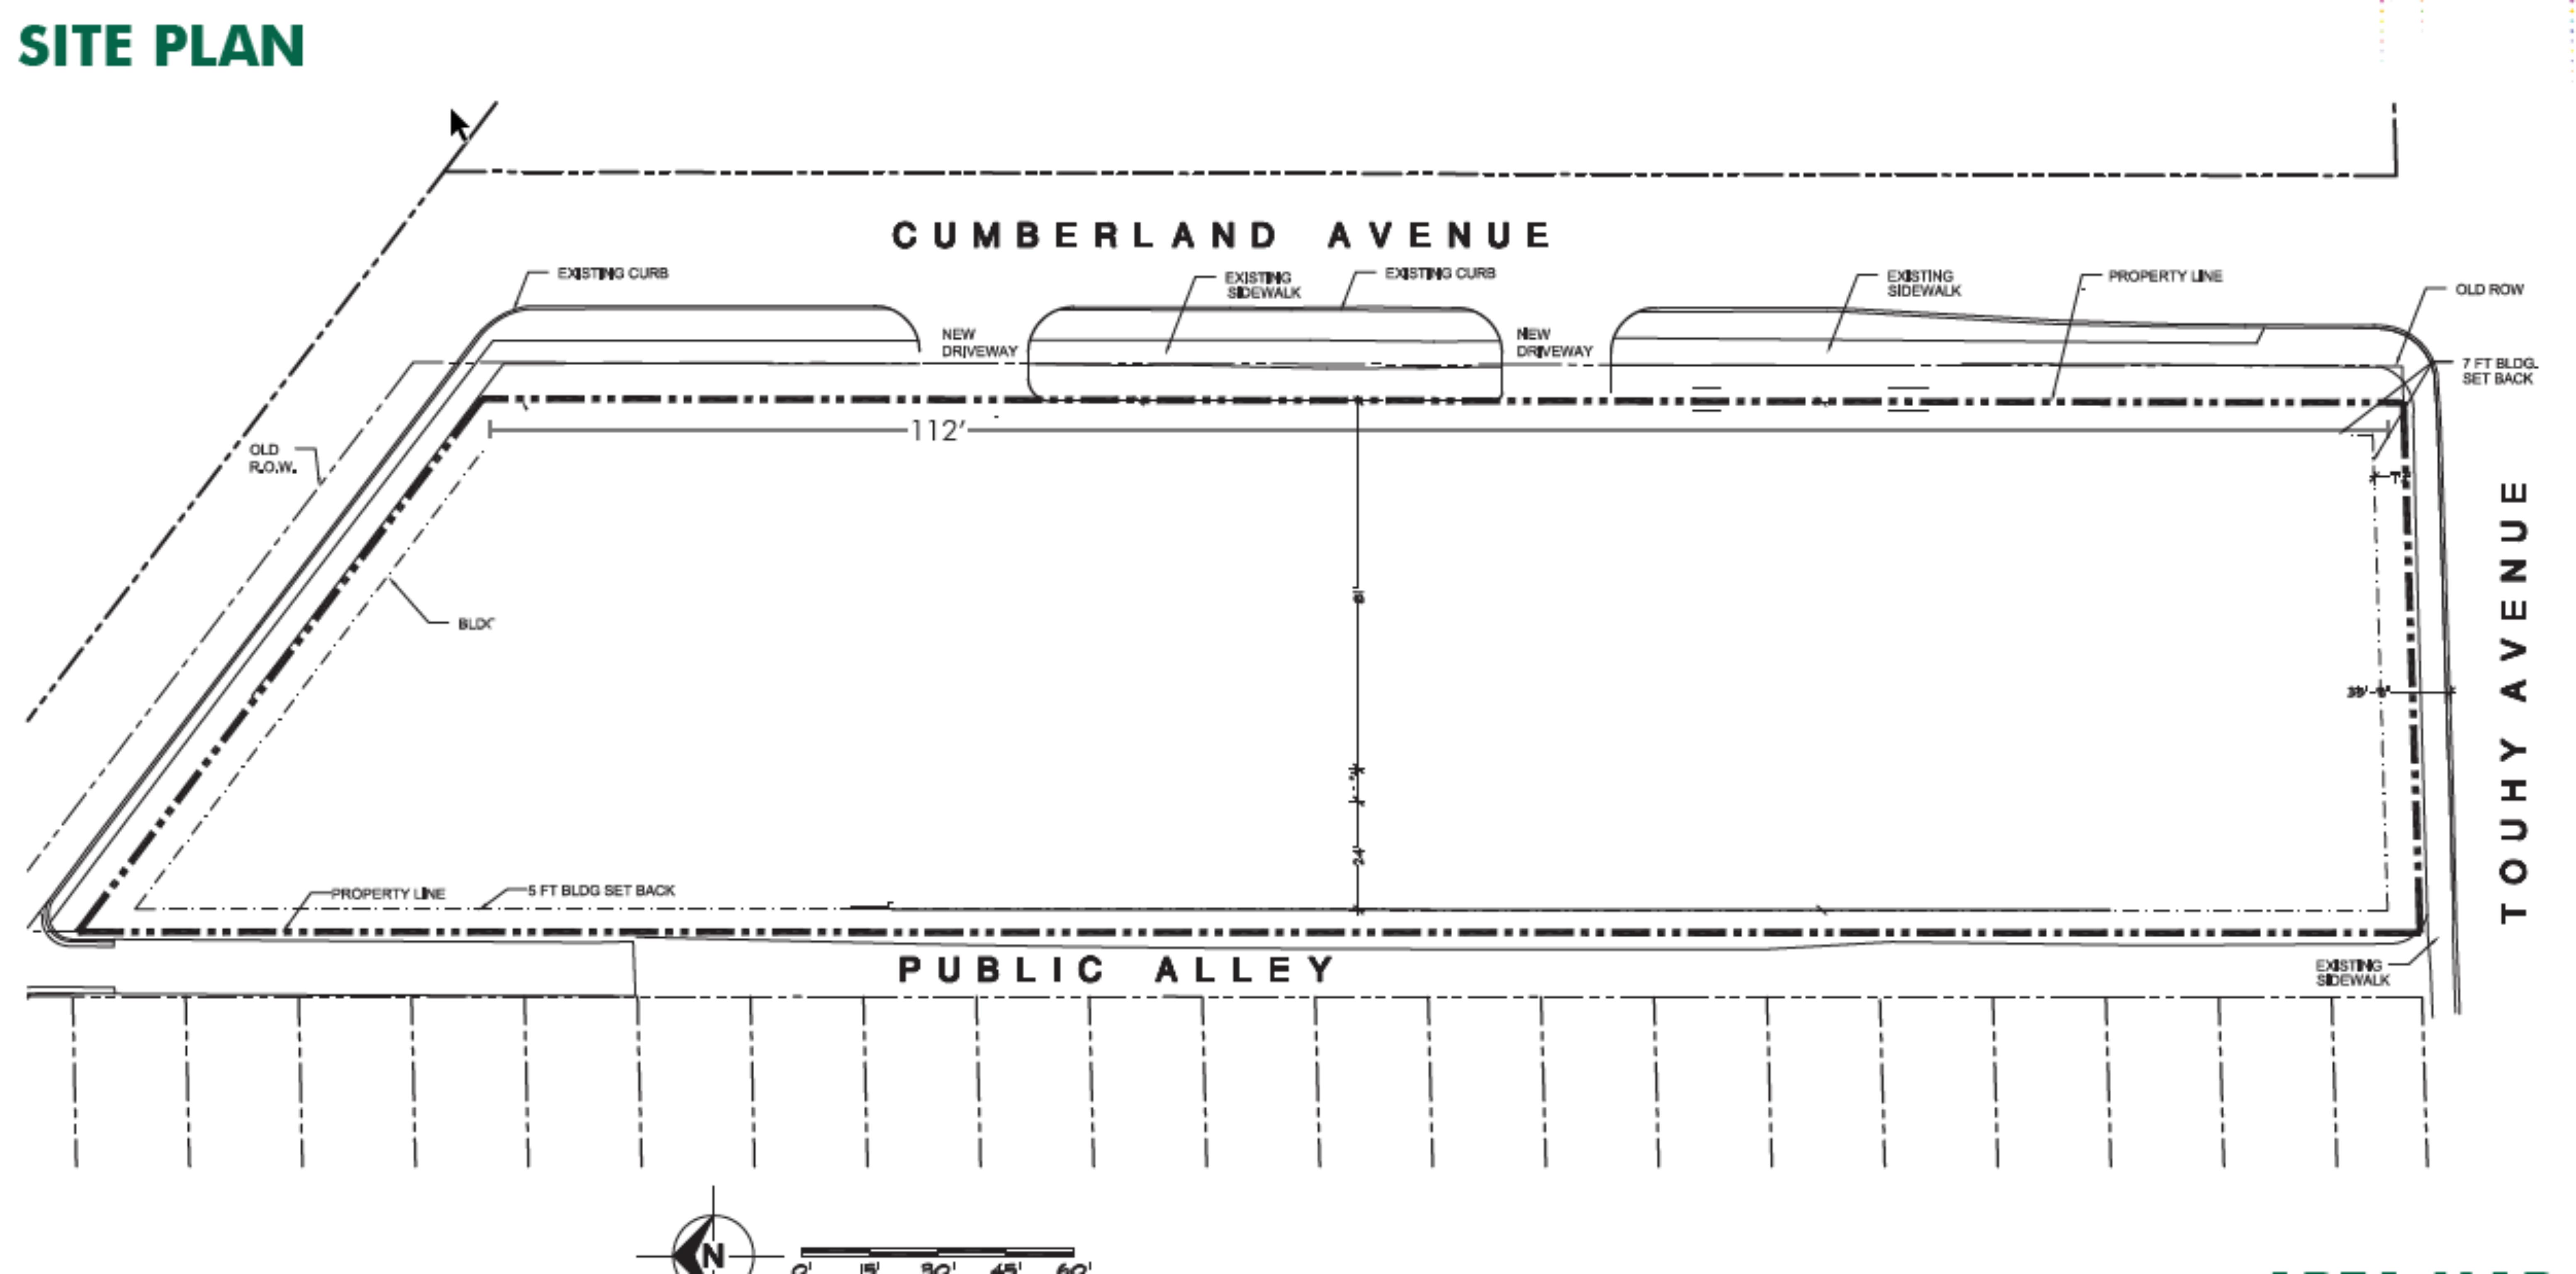 10 N. Cumberland Ave.: site plan